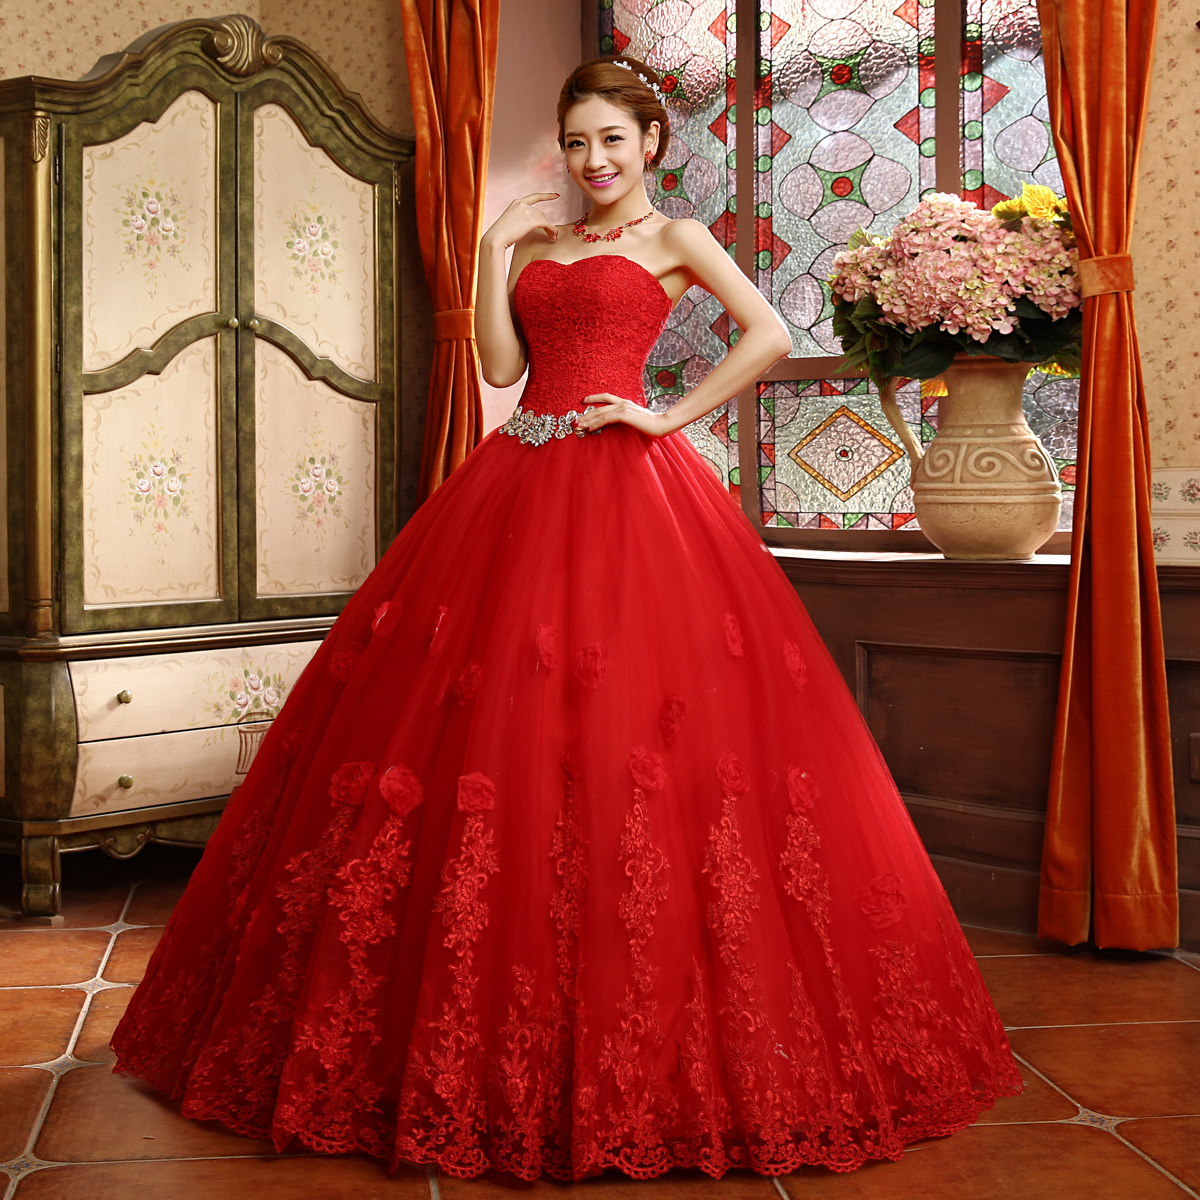 wedding dresses under wedding dress online David Bridal Chiffon Sheath Illusion Sleeves